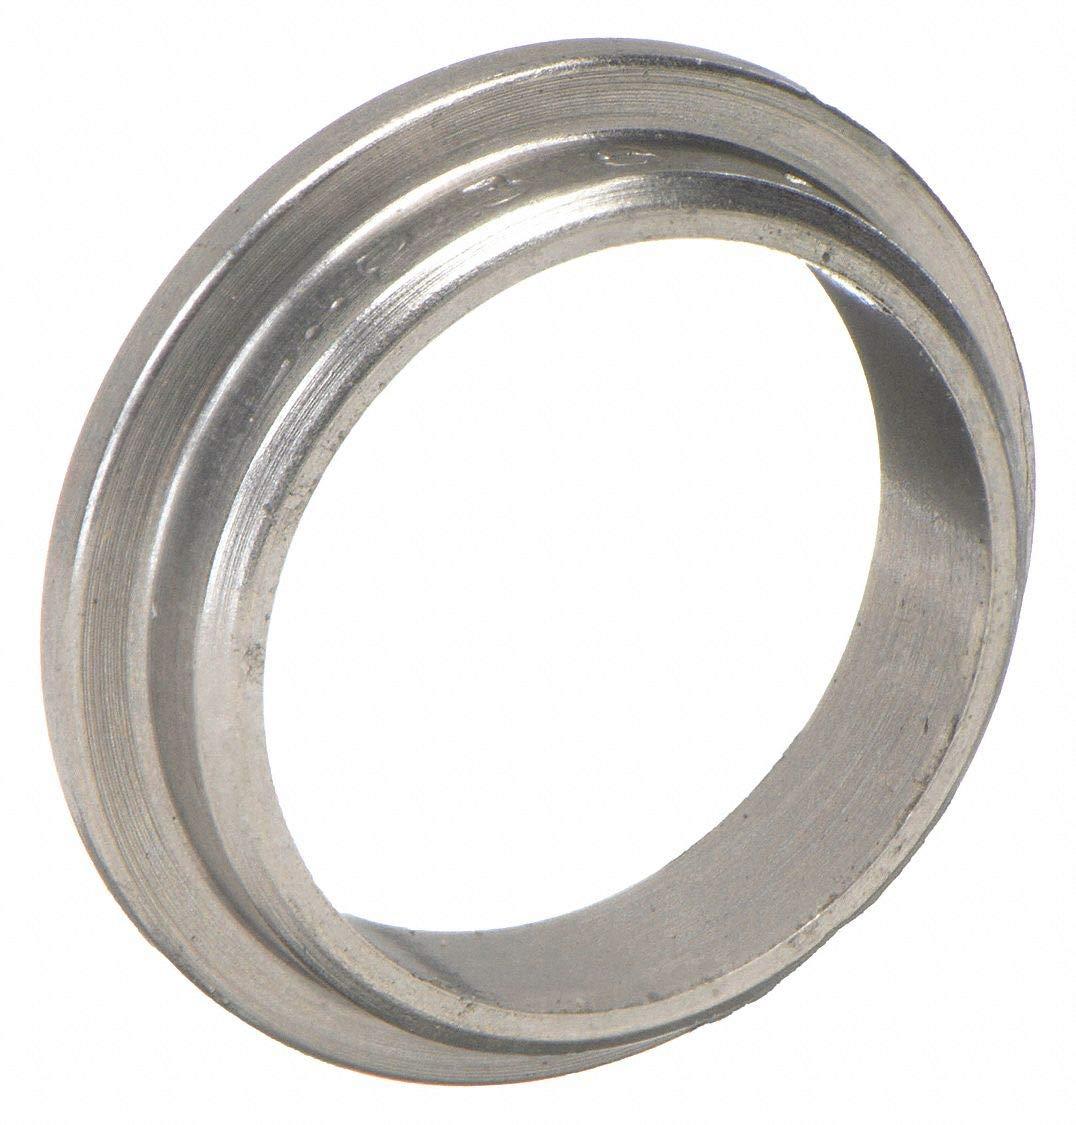 Parker Hannifin 5BF5-316 A-LOK Stainless Steel Back Ferrule Tube Fitting, 5/16